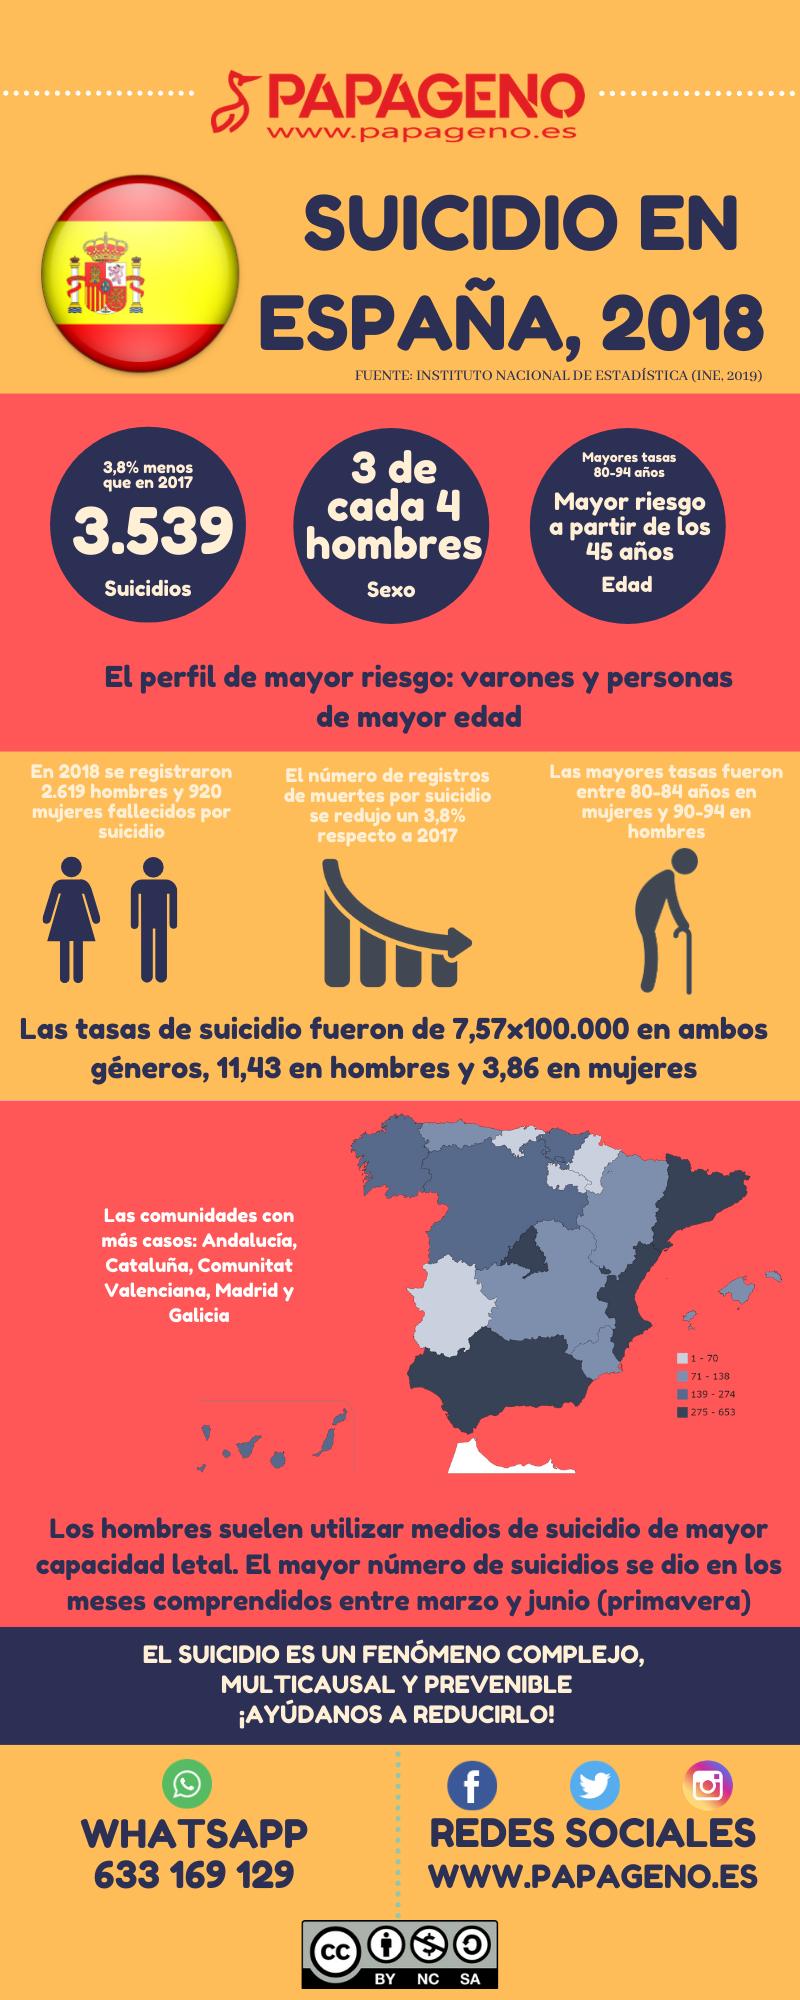 Suicidio en España, 2018